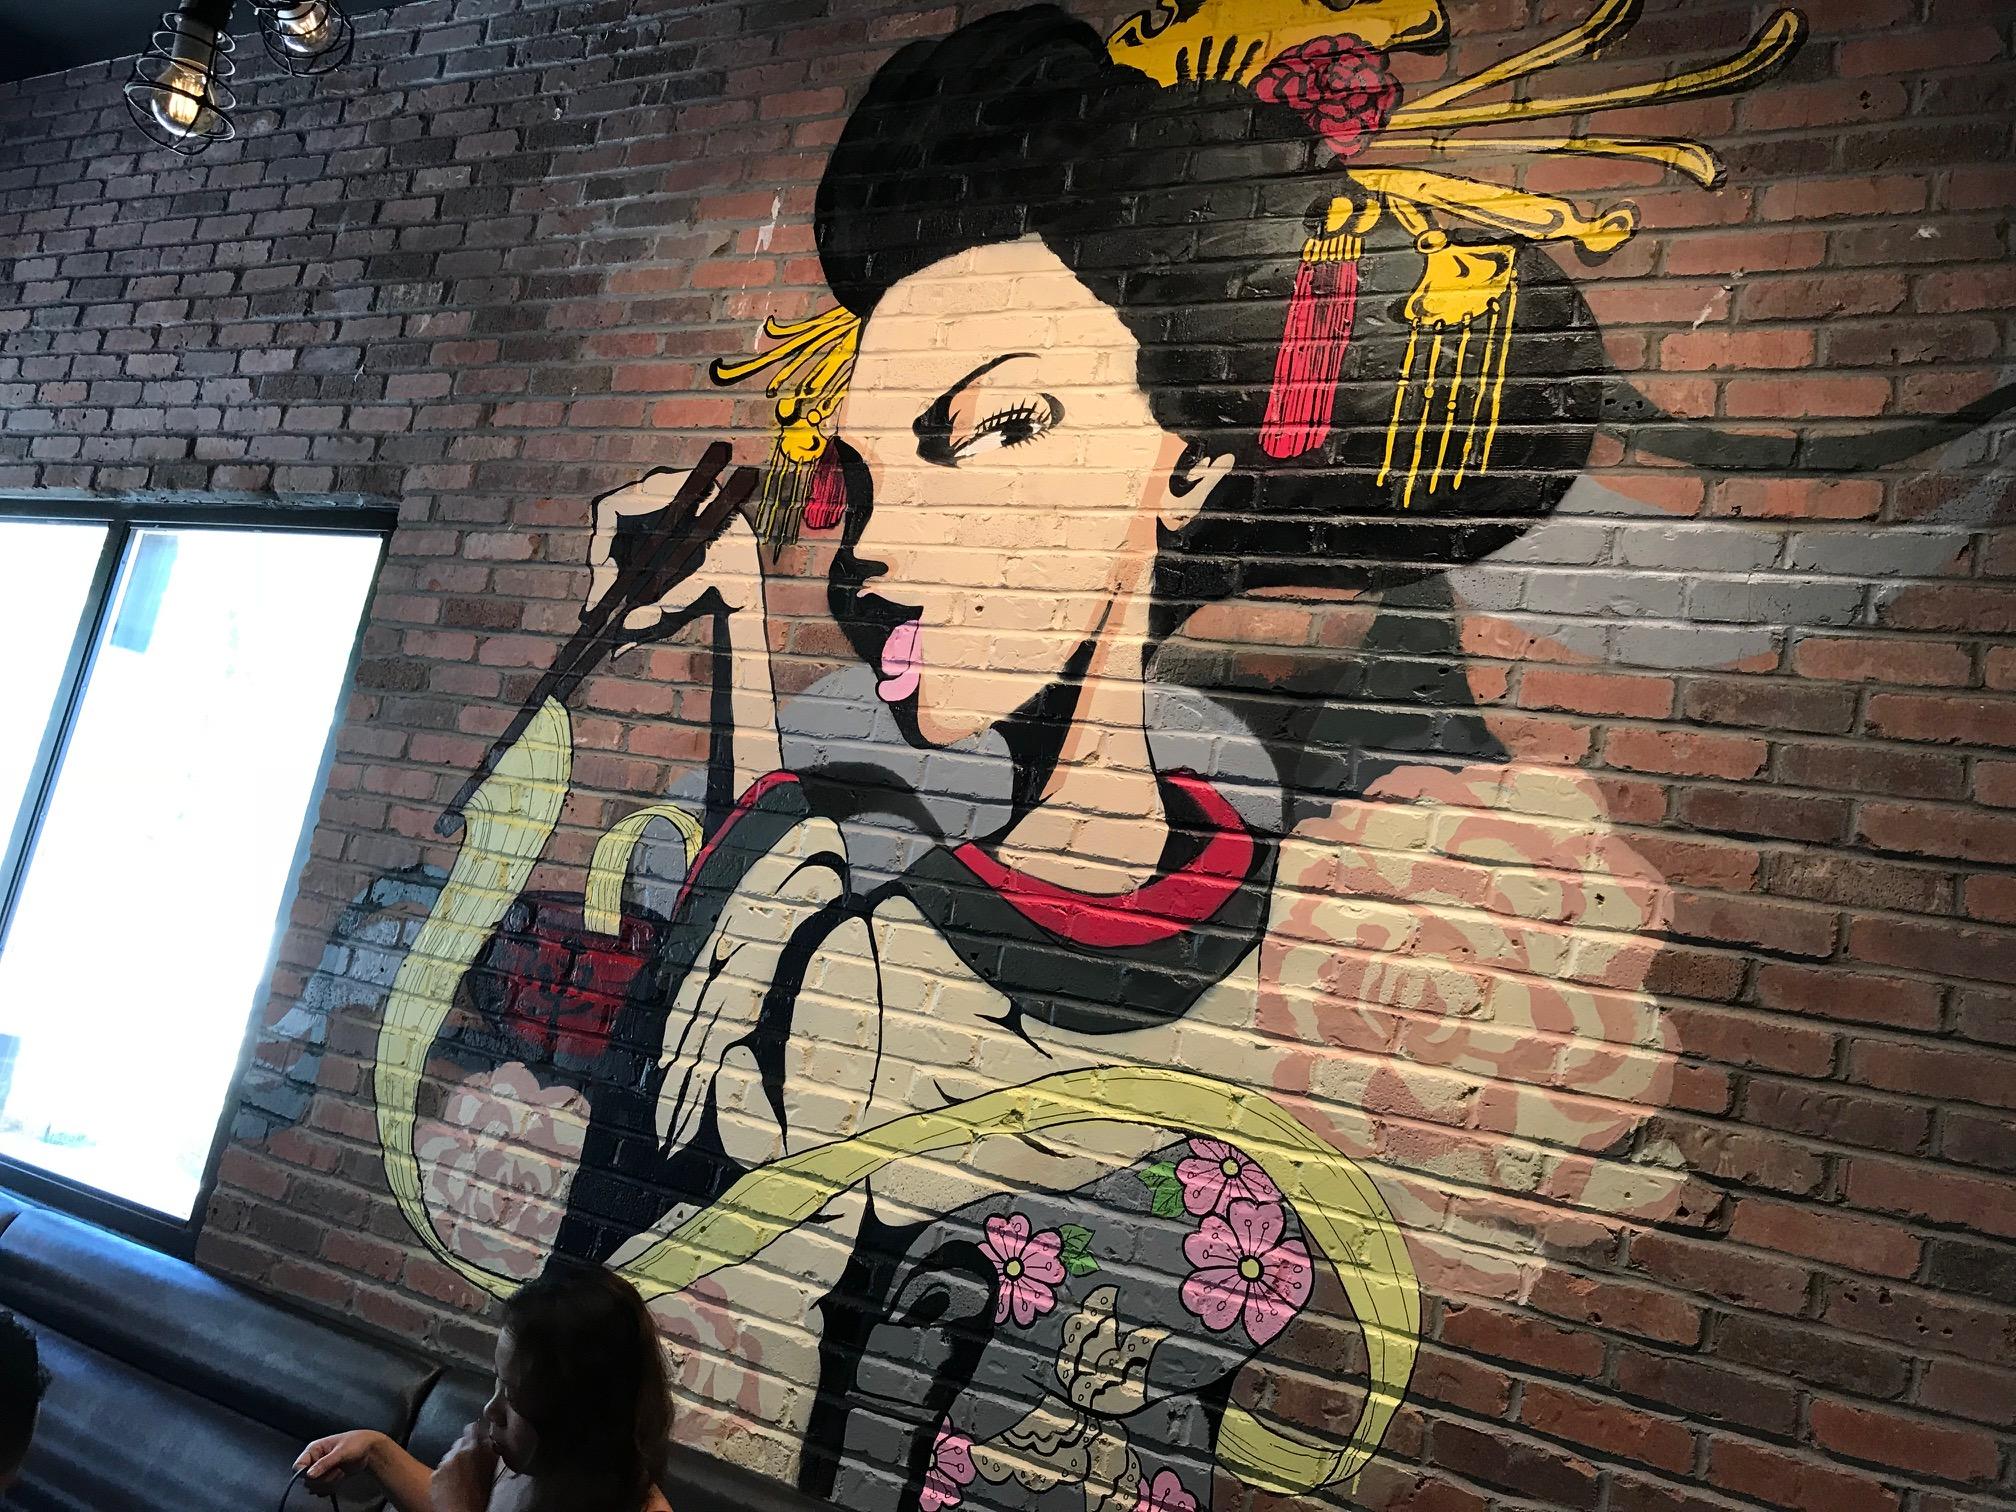 A colorful Asian mural greets patrons at Logan Circle's Jinya Ramen Bar  second level